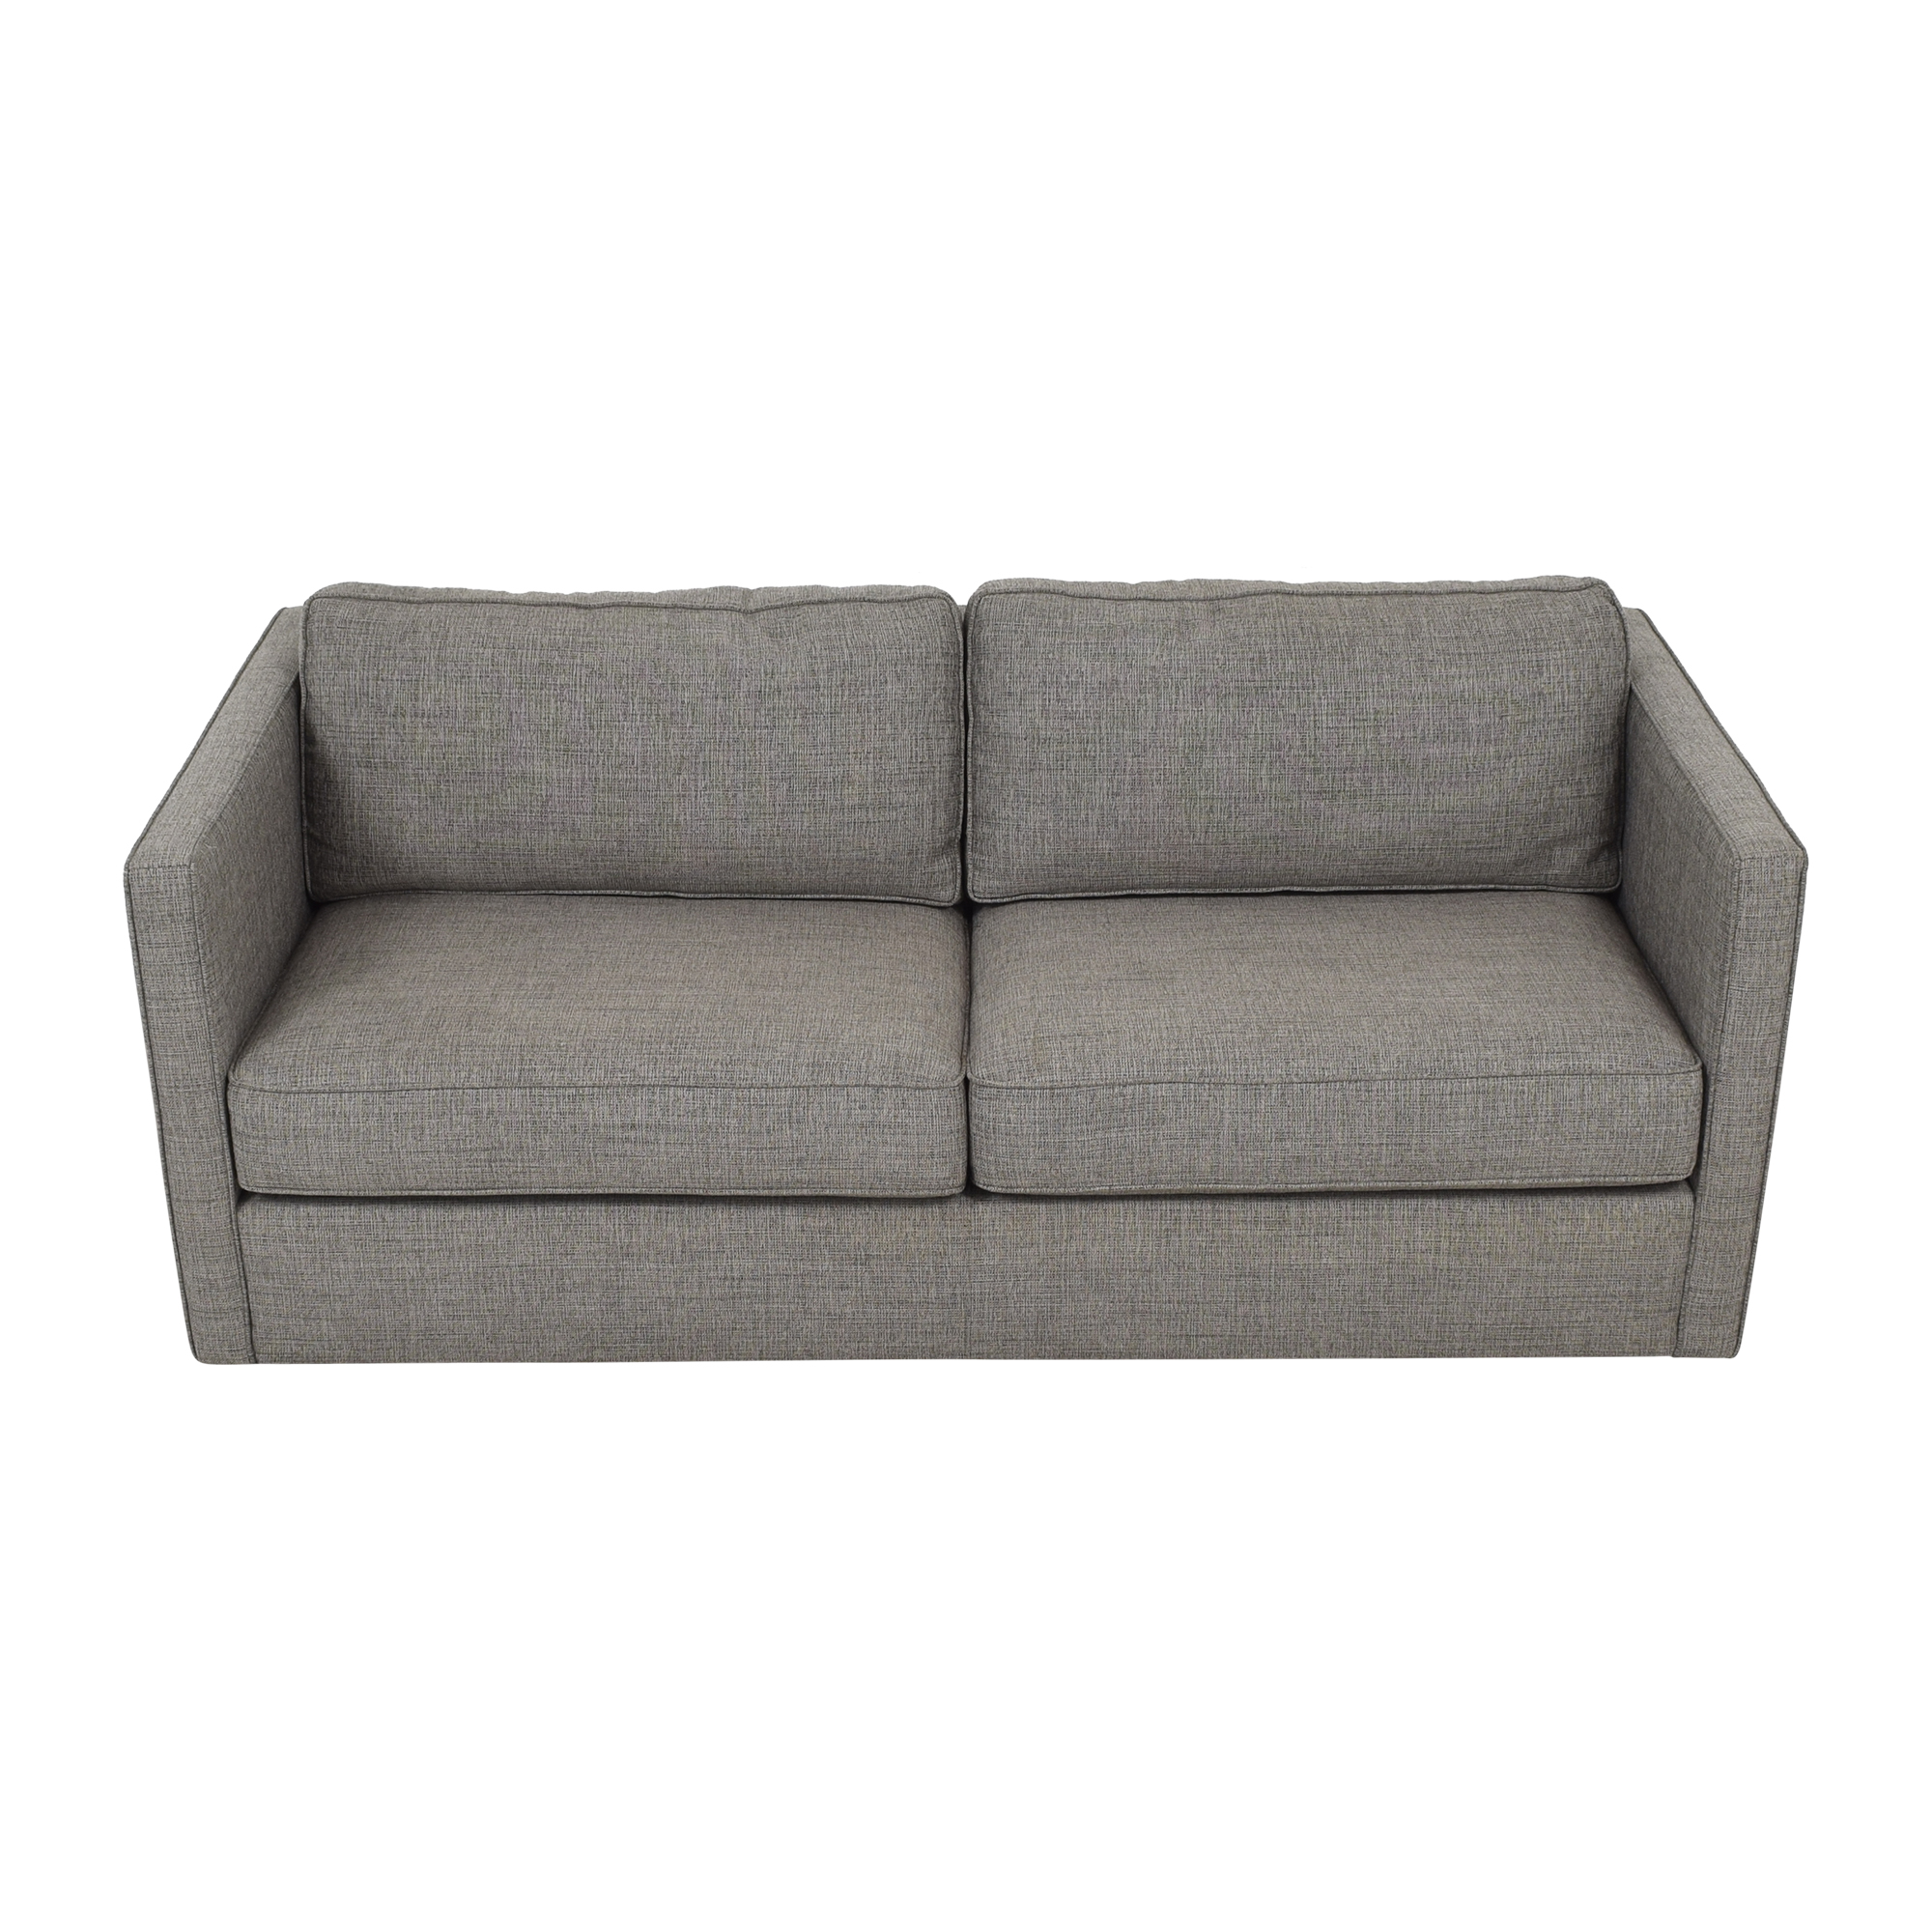 Room & Board Watson Guest Select Sleeper Sofa / Sofas